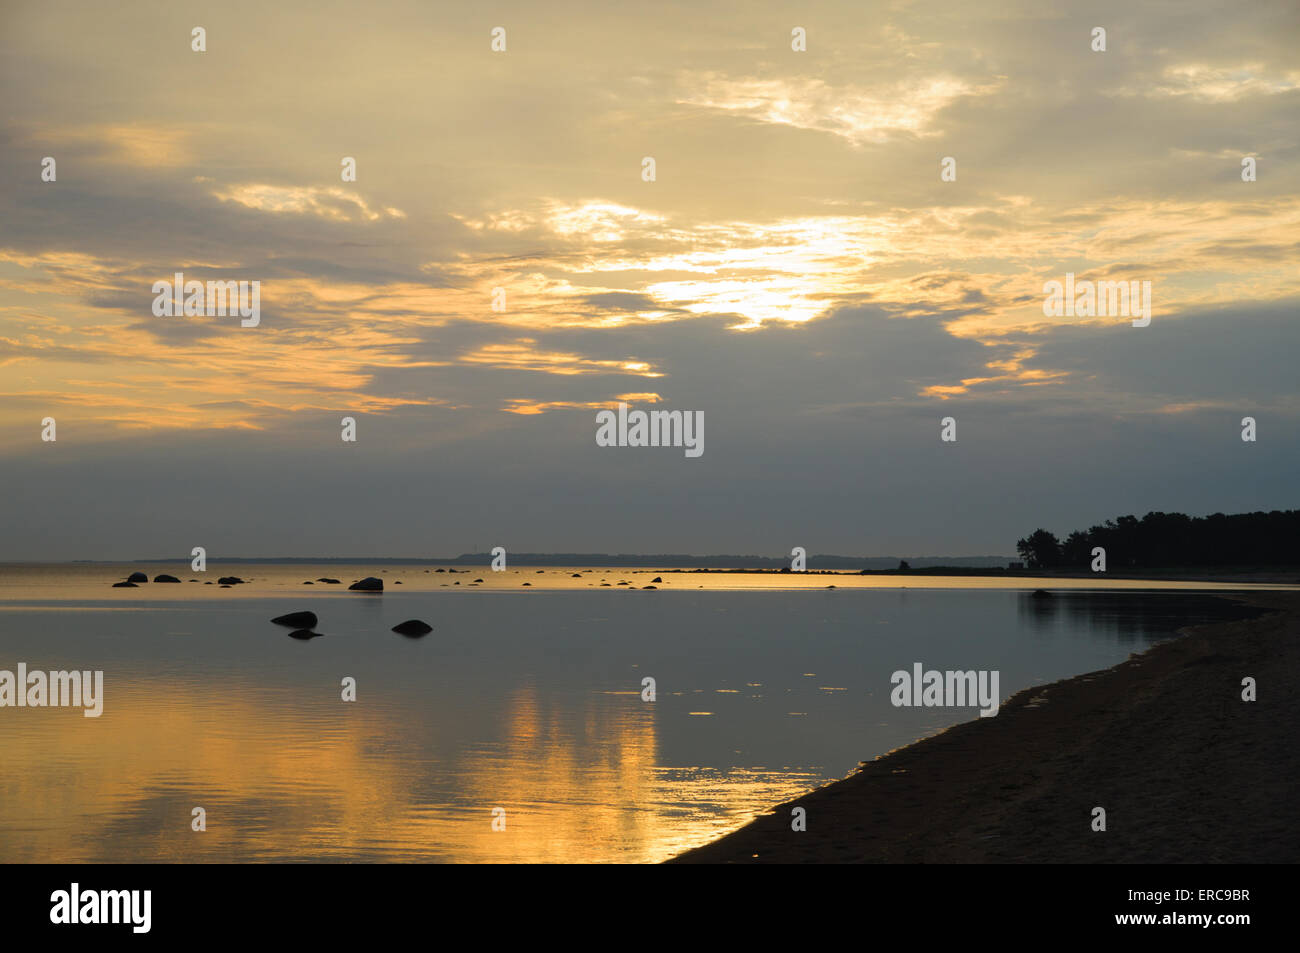 Sunrise over coastline silhouette - Stock Image